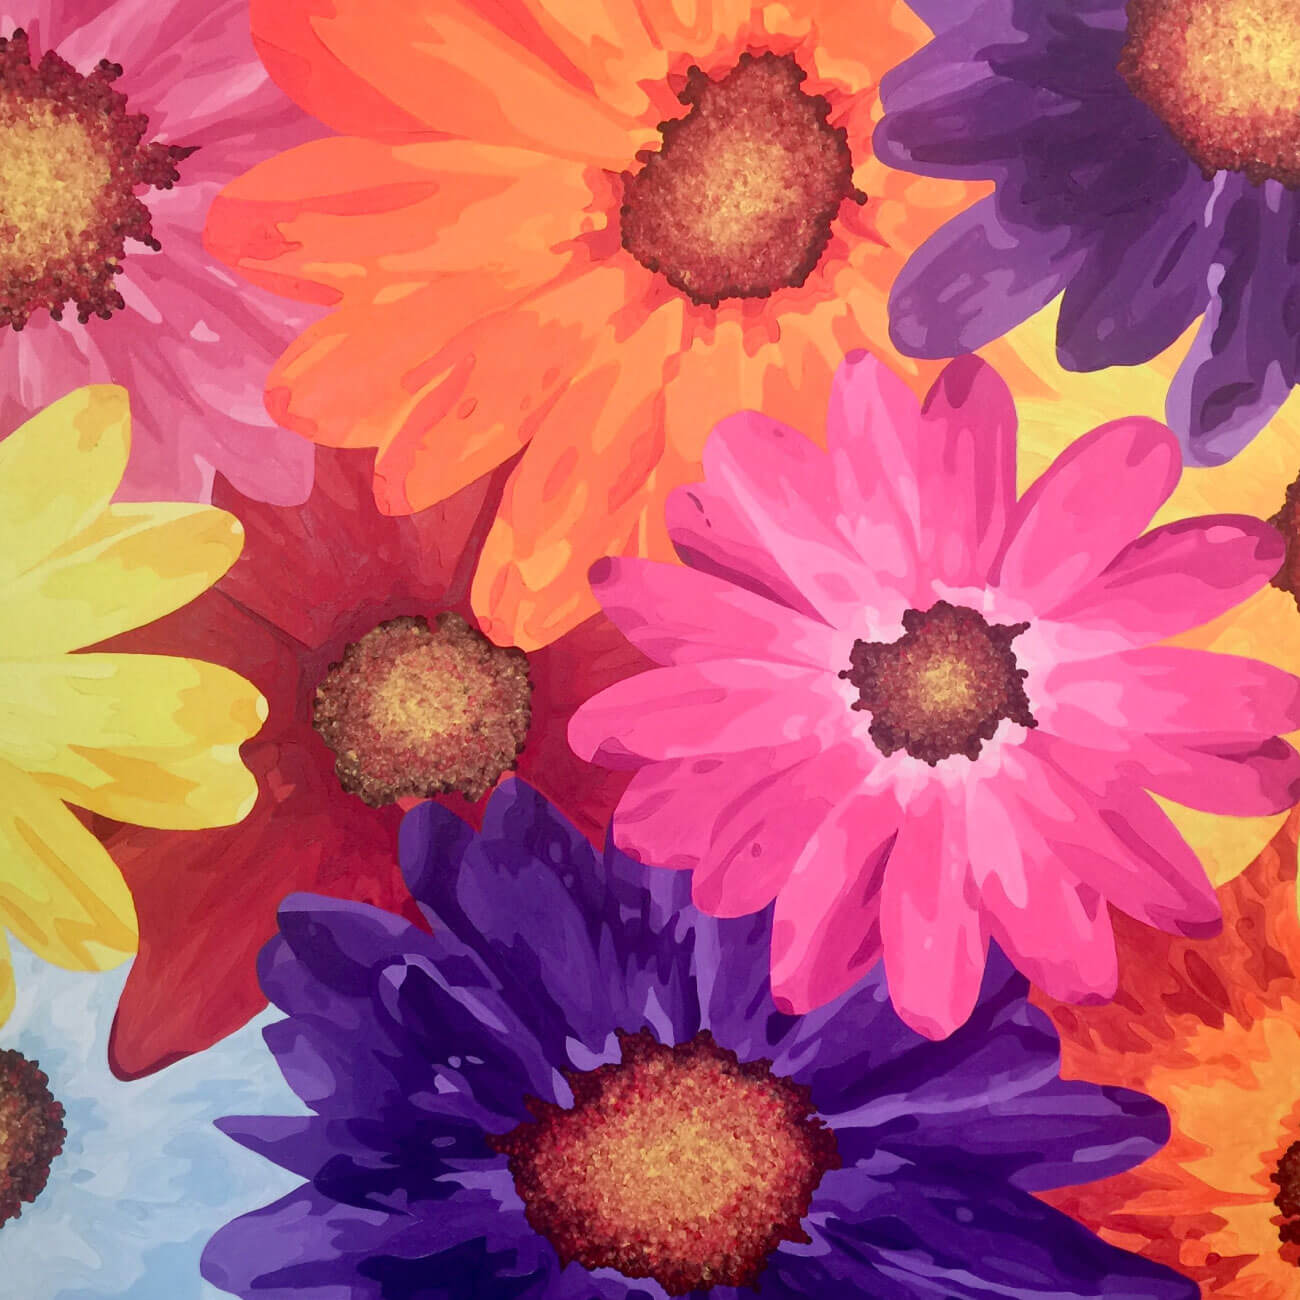 Pintura al oleo de flores. Promesas